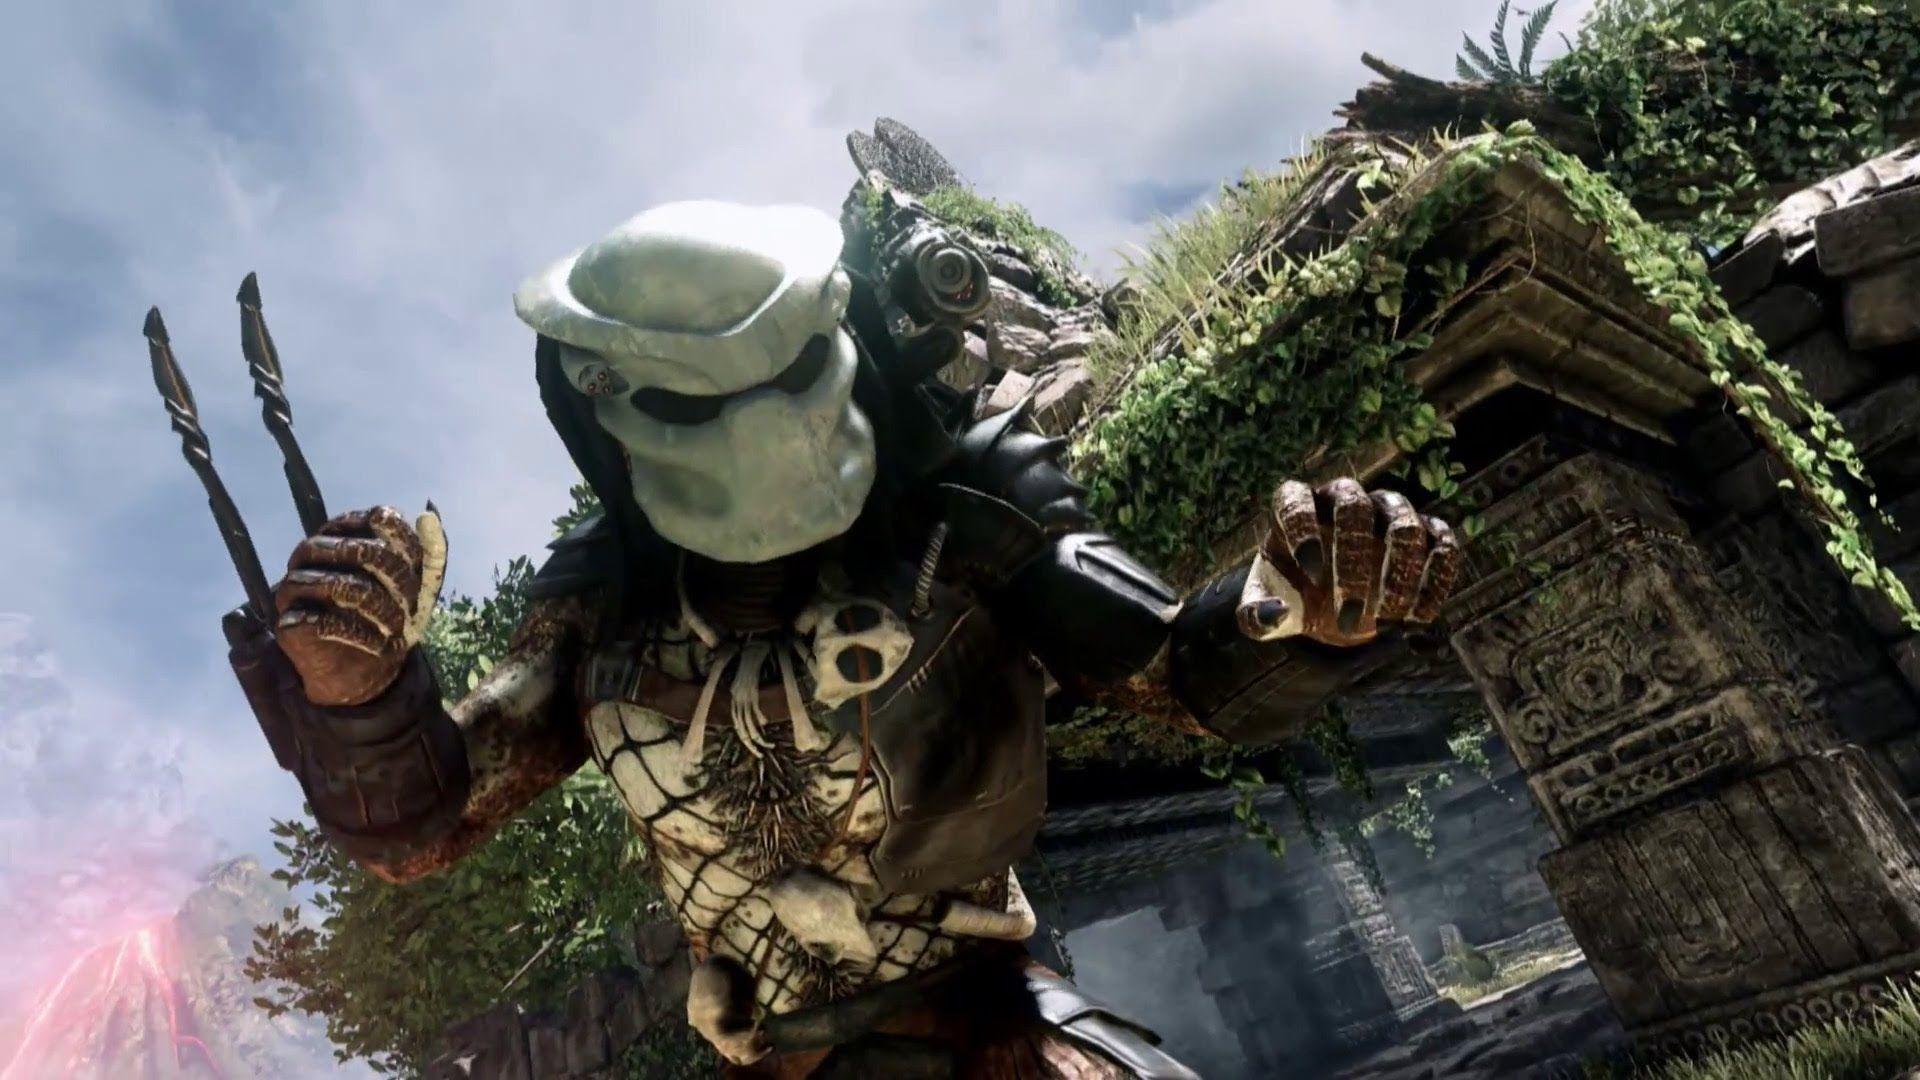 Call Of Duty Ghosts Devastation Dlc Trailer Predator Predator Computer Computer Wallpaper Call Of Duty Ghosts